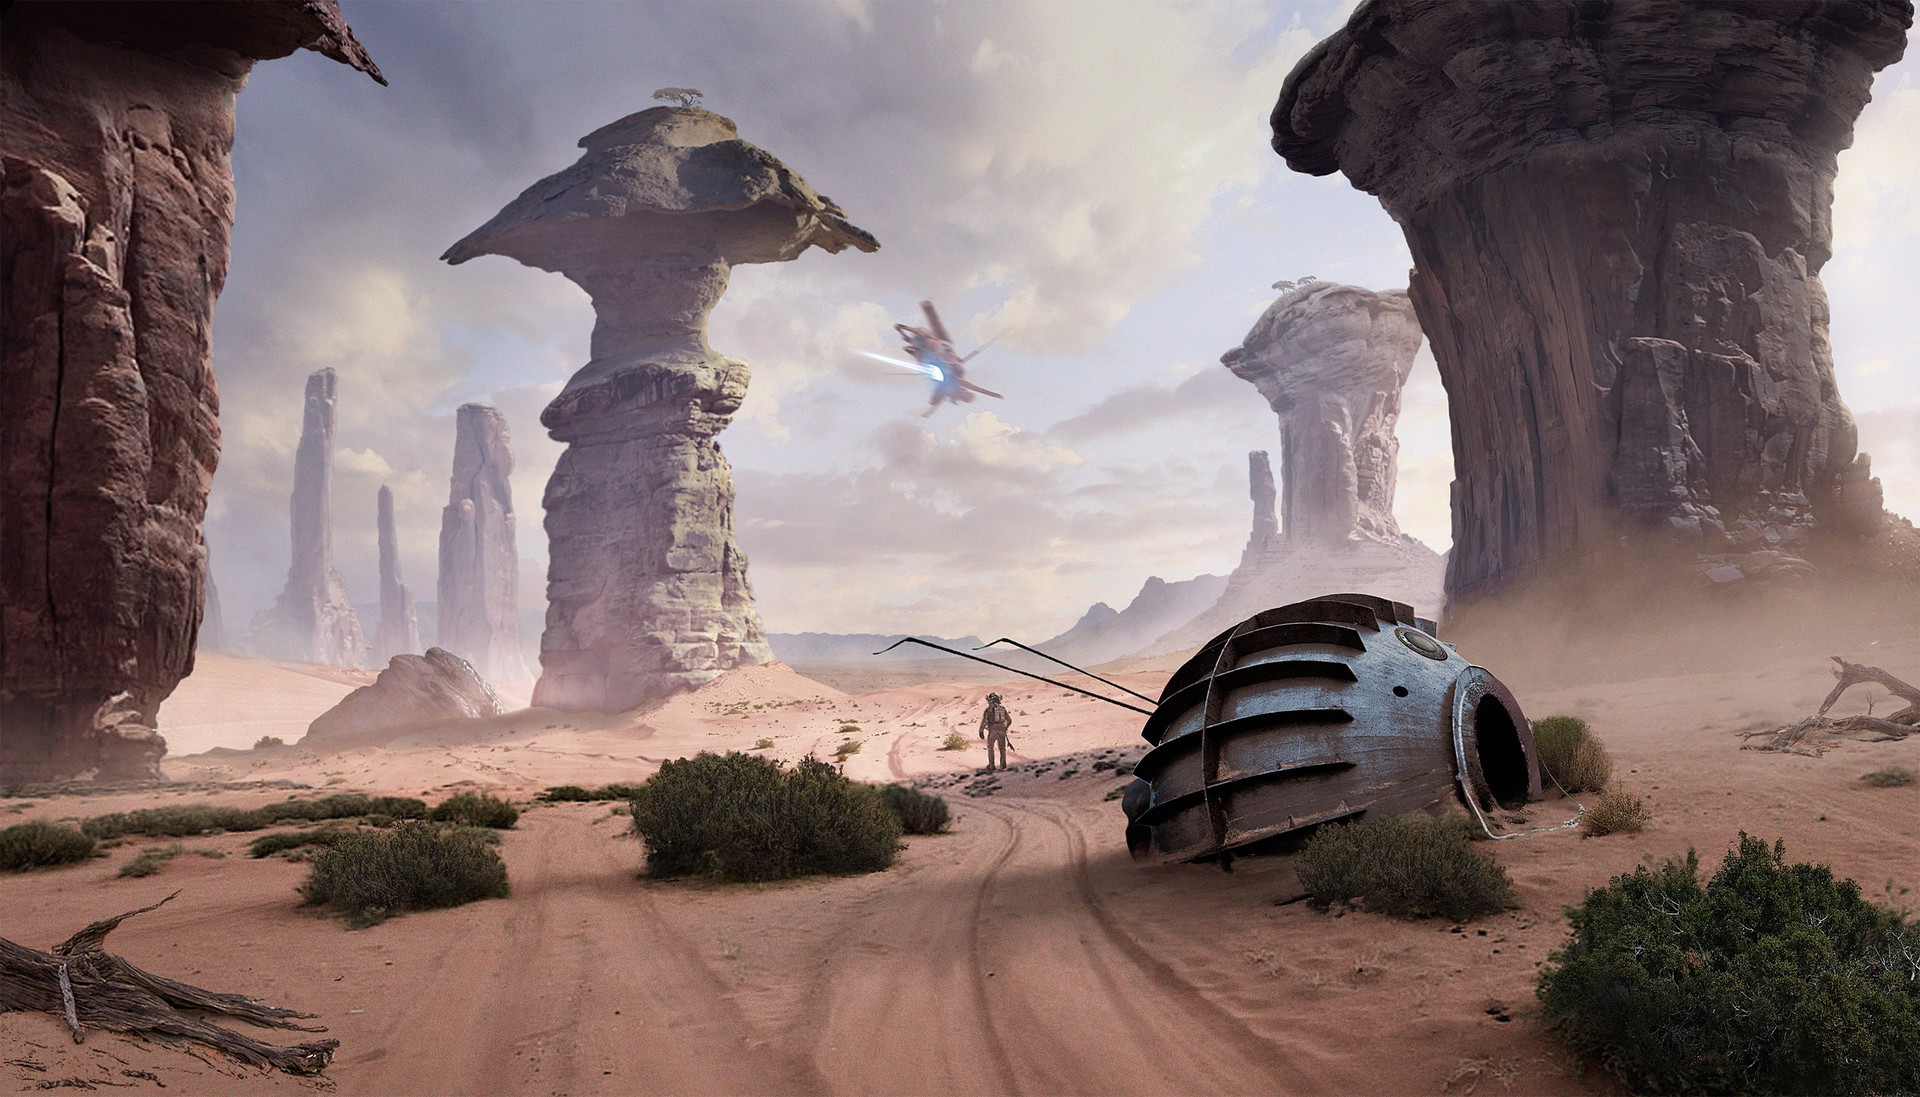 Best ideas about Star Wars Landscape . Save or Pin landscape Star Wars Spaceship Wallpapers HD Desktop Now.